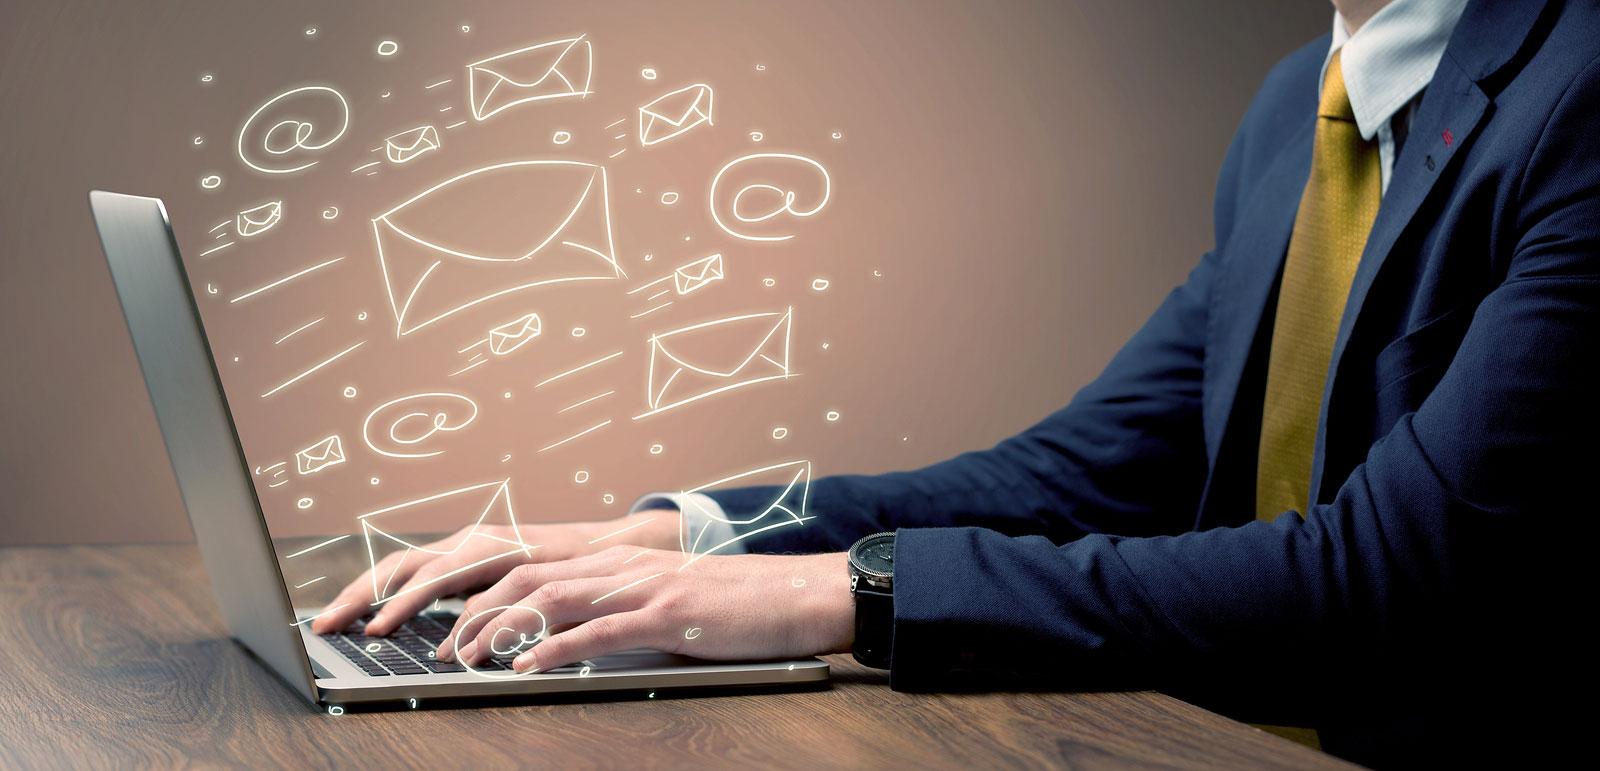 Businessperson sending email